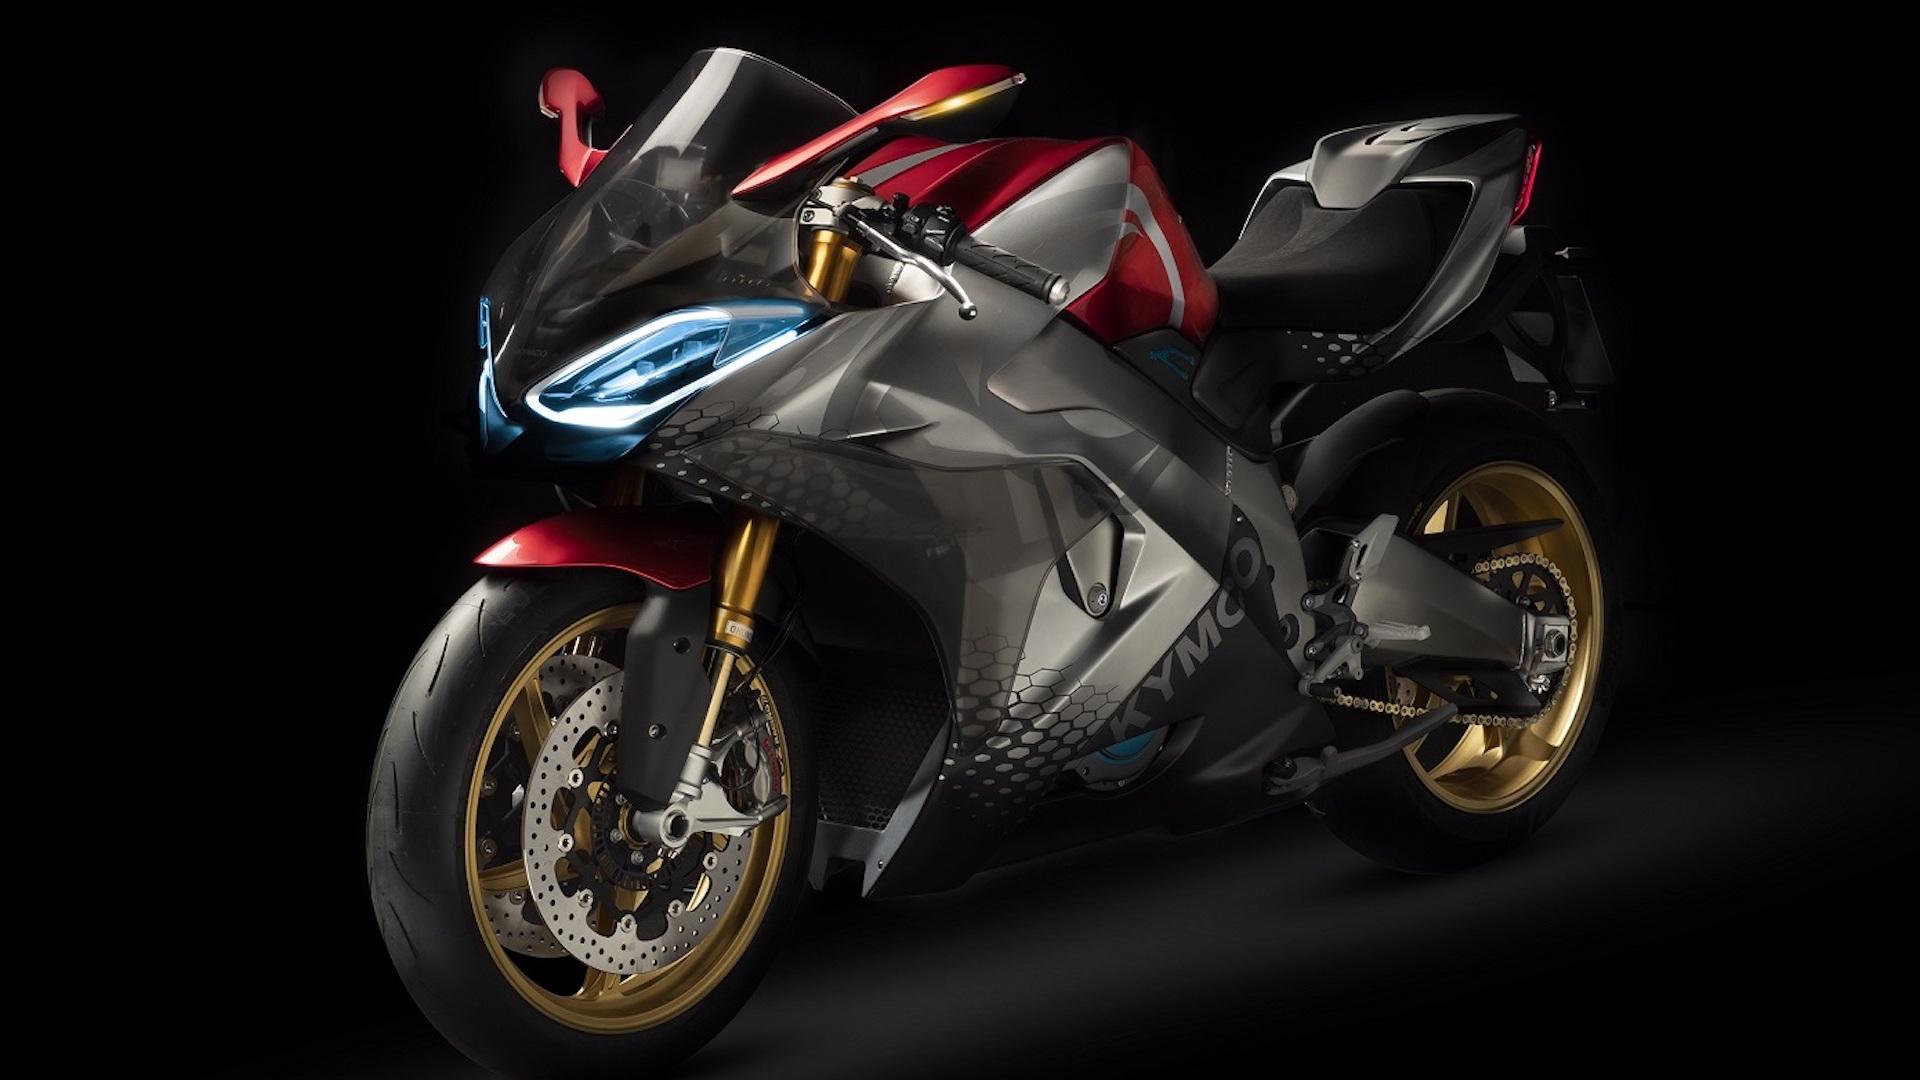 kymco d voile sa moto sportive lectrique 0 100 km h en 2 9 secondes 250 km h max vroom. Black Bedroom Furniture Sets. Home Design Ideas